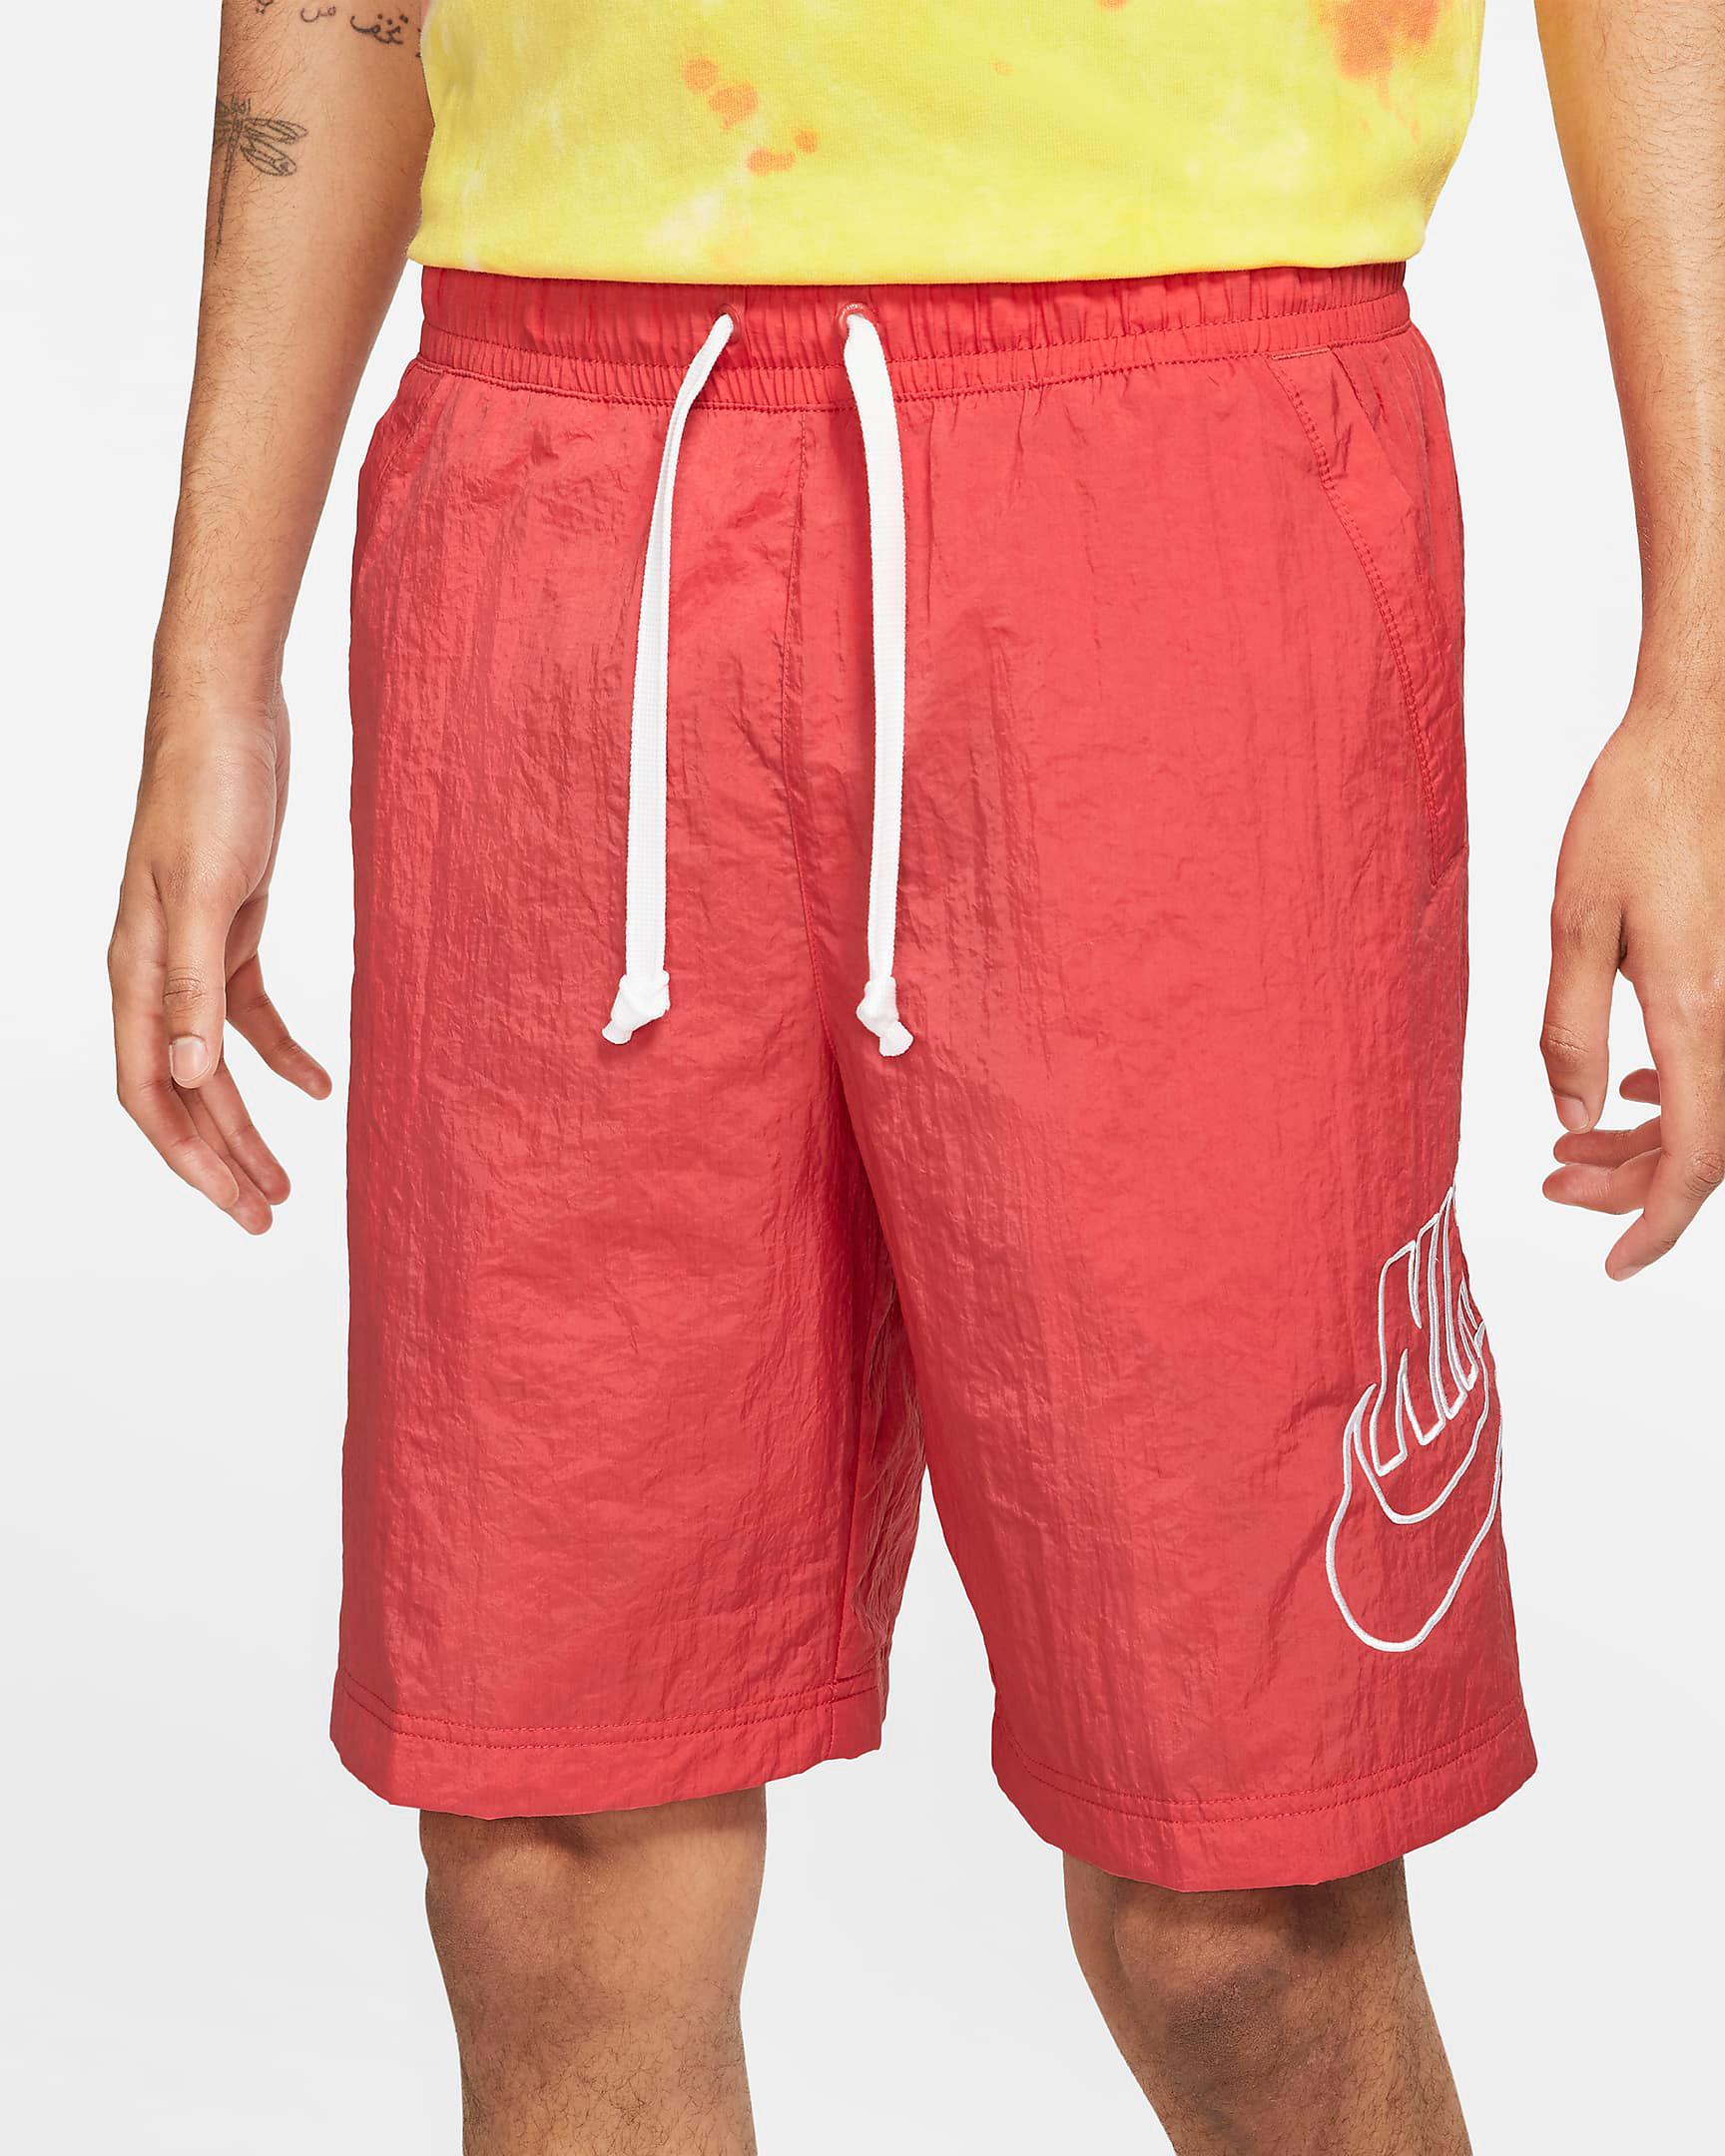 nike-lobster-alumni-woven-shorts